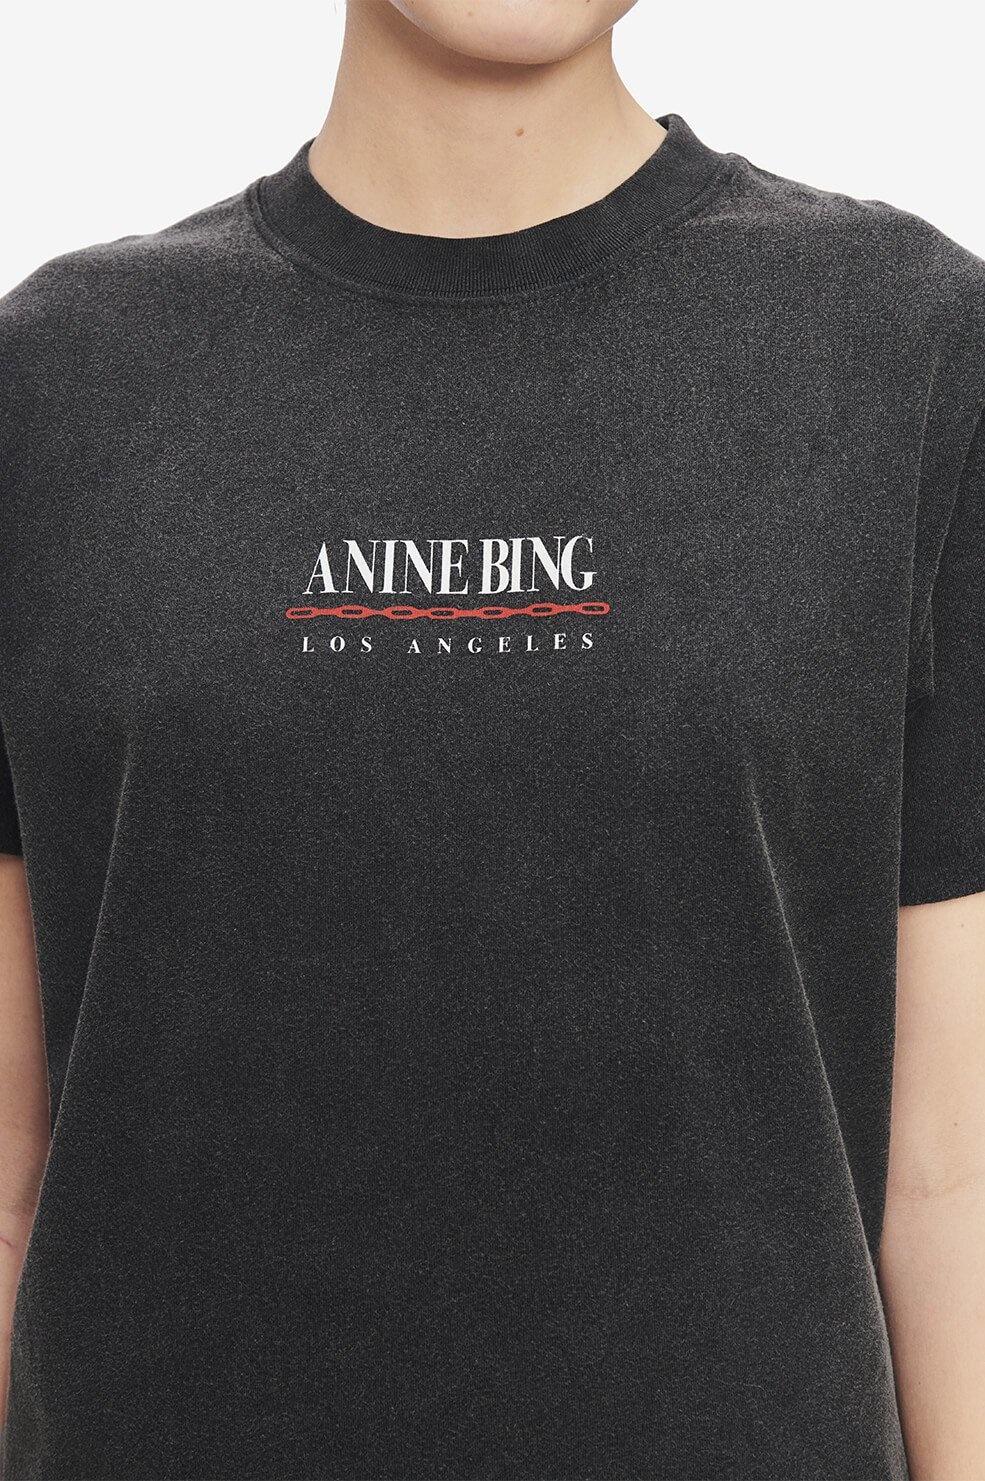 ANINE BING t-shirt lili link-3